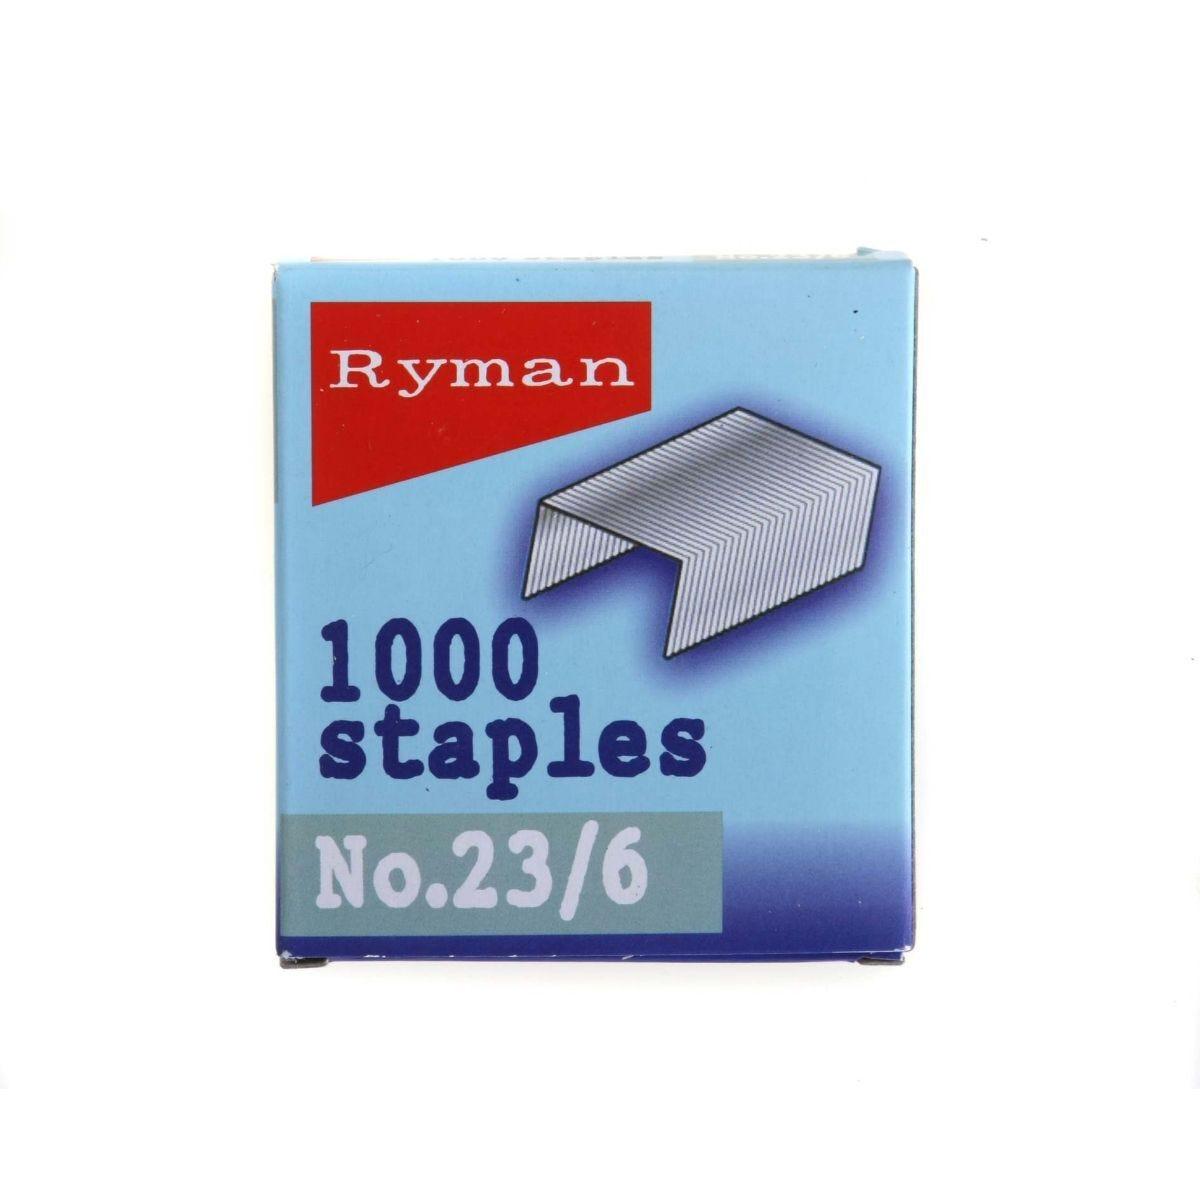 Ryman Staples 23/6mm Pack of 1000